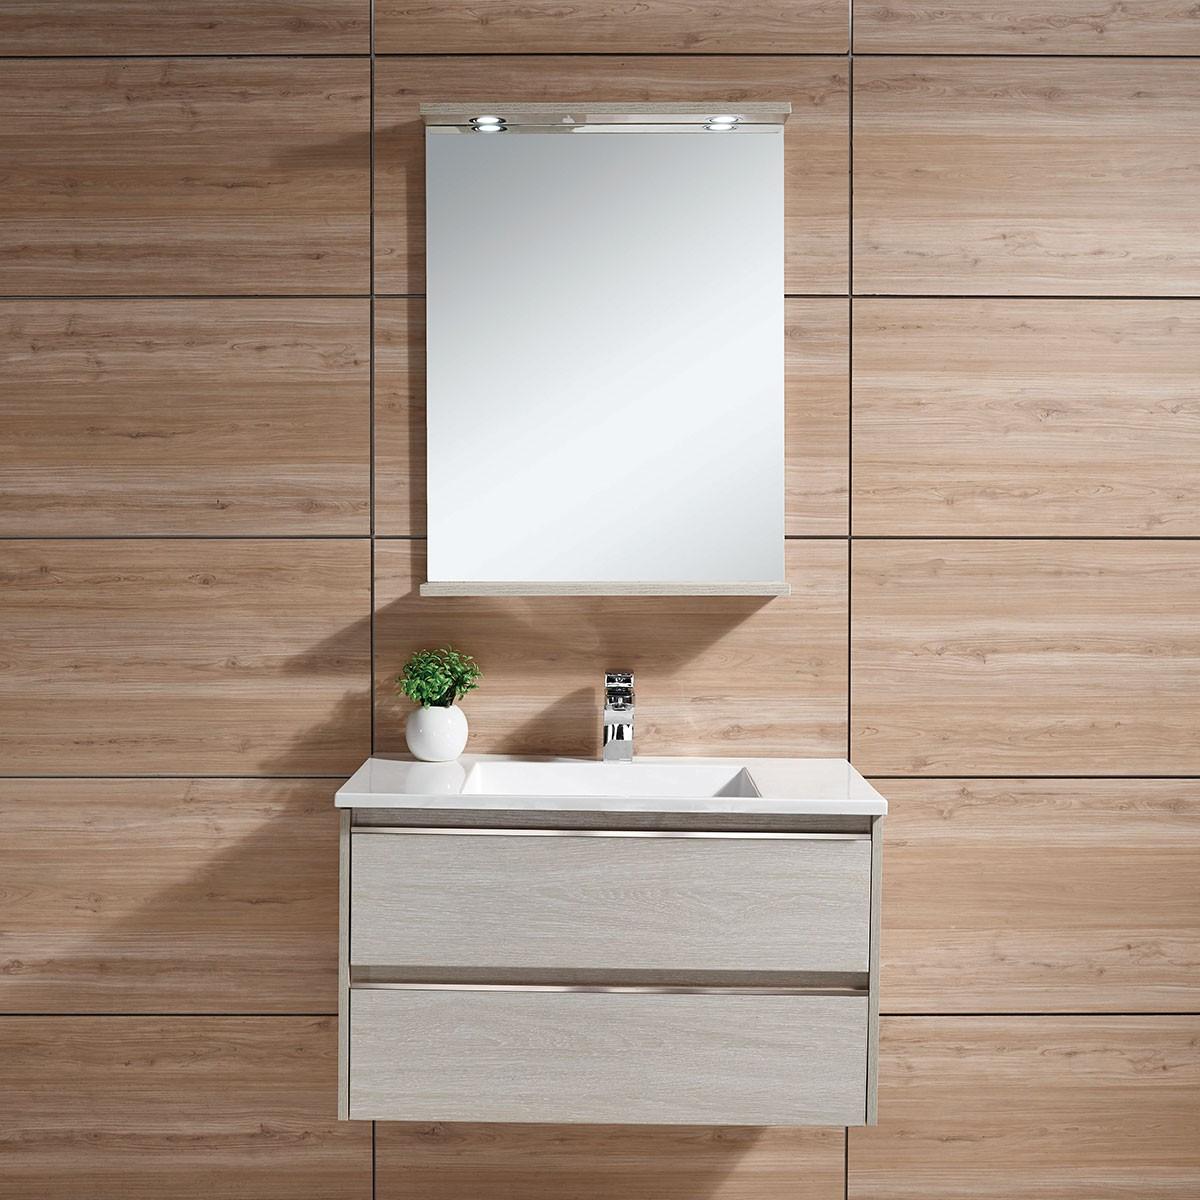 31 In. Wall-Mount Bathroom Vanity Set with Mirror (DK-603800)